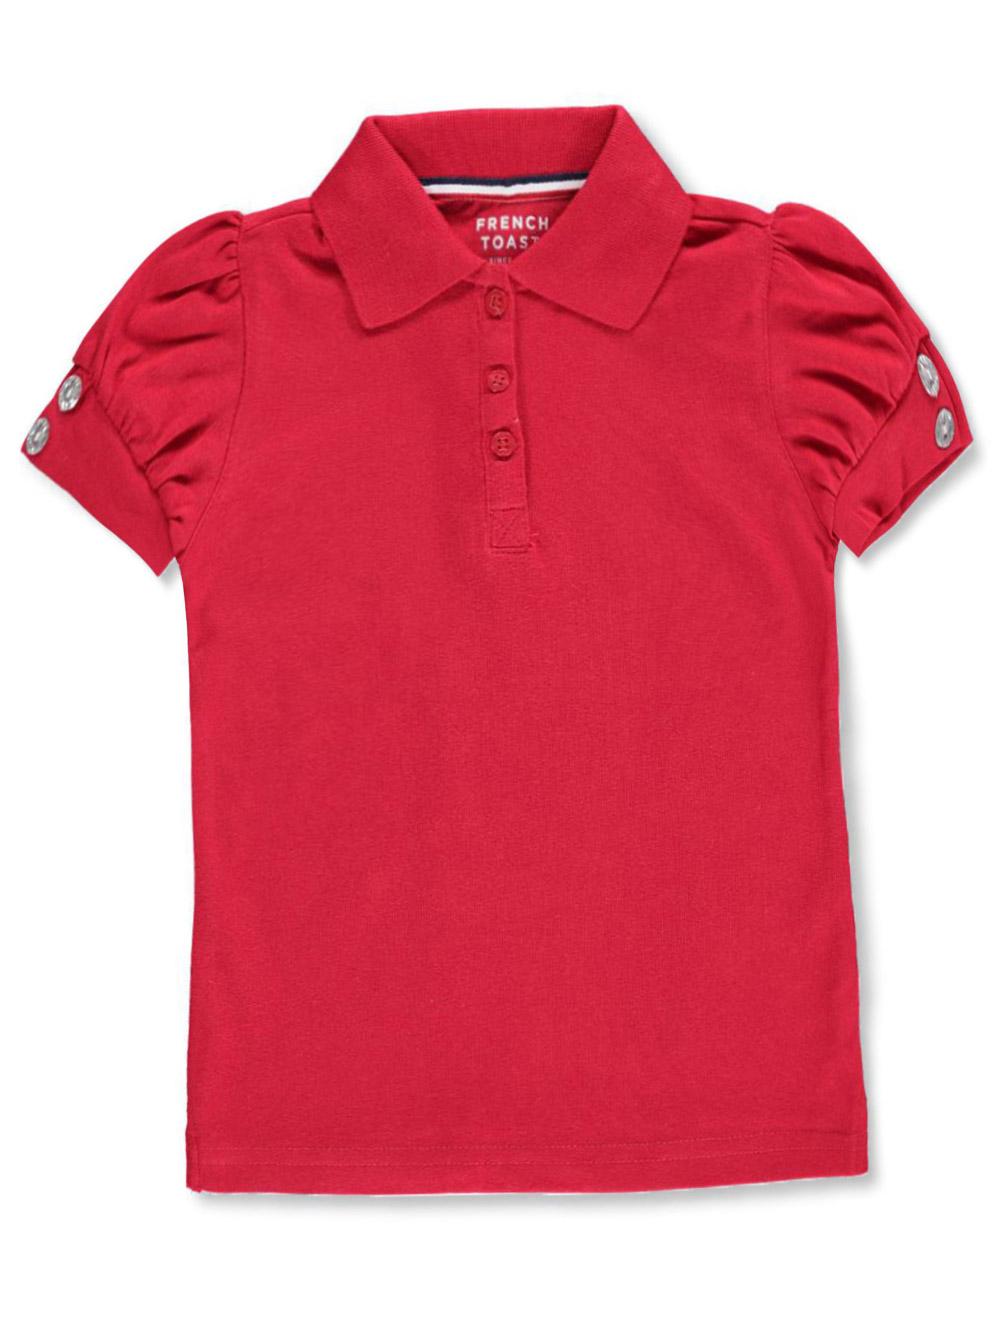 Image of French Toast School Uniform Big Girls Rhinestone SS Polo Shirt Sizes 7  16  red 1012